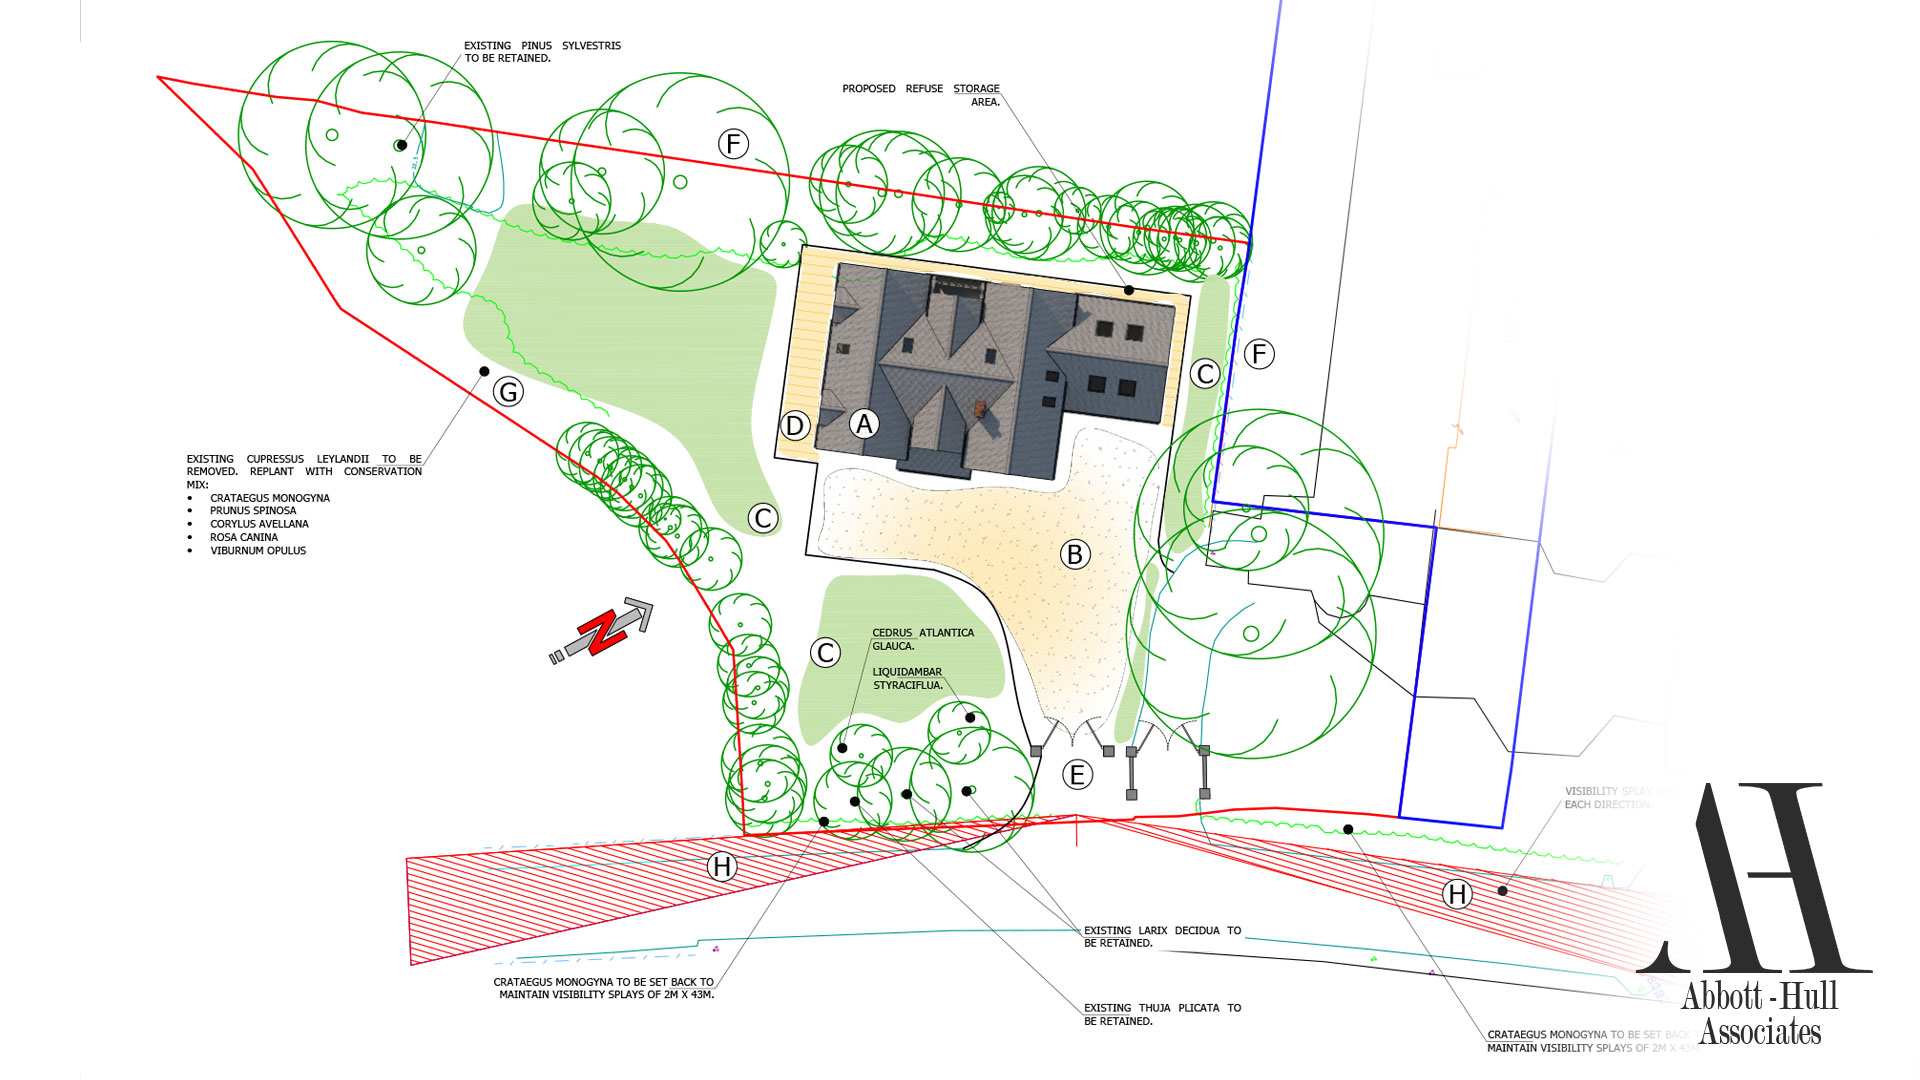 New Dwelling, Applegarth, Singleton - Proposed Site Plans